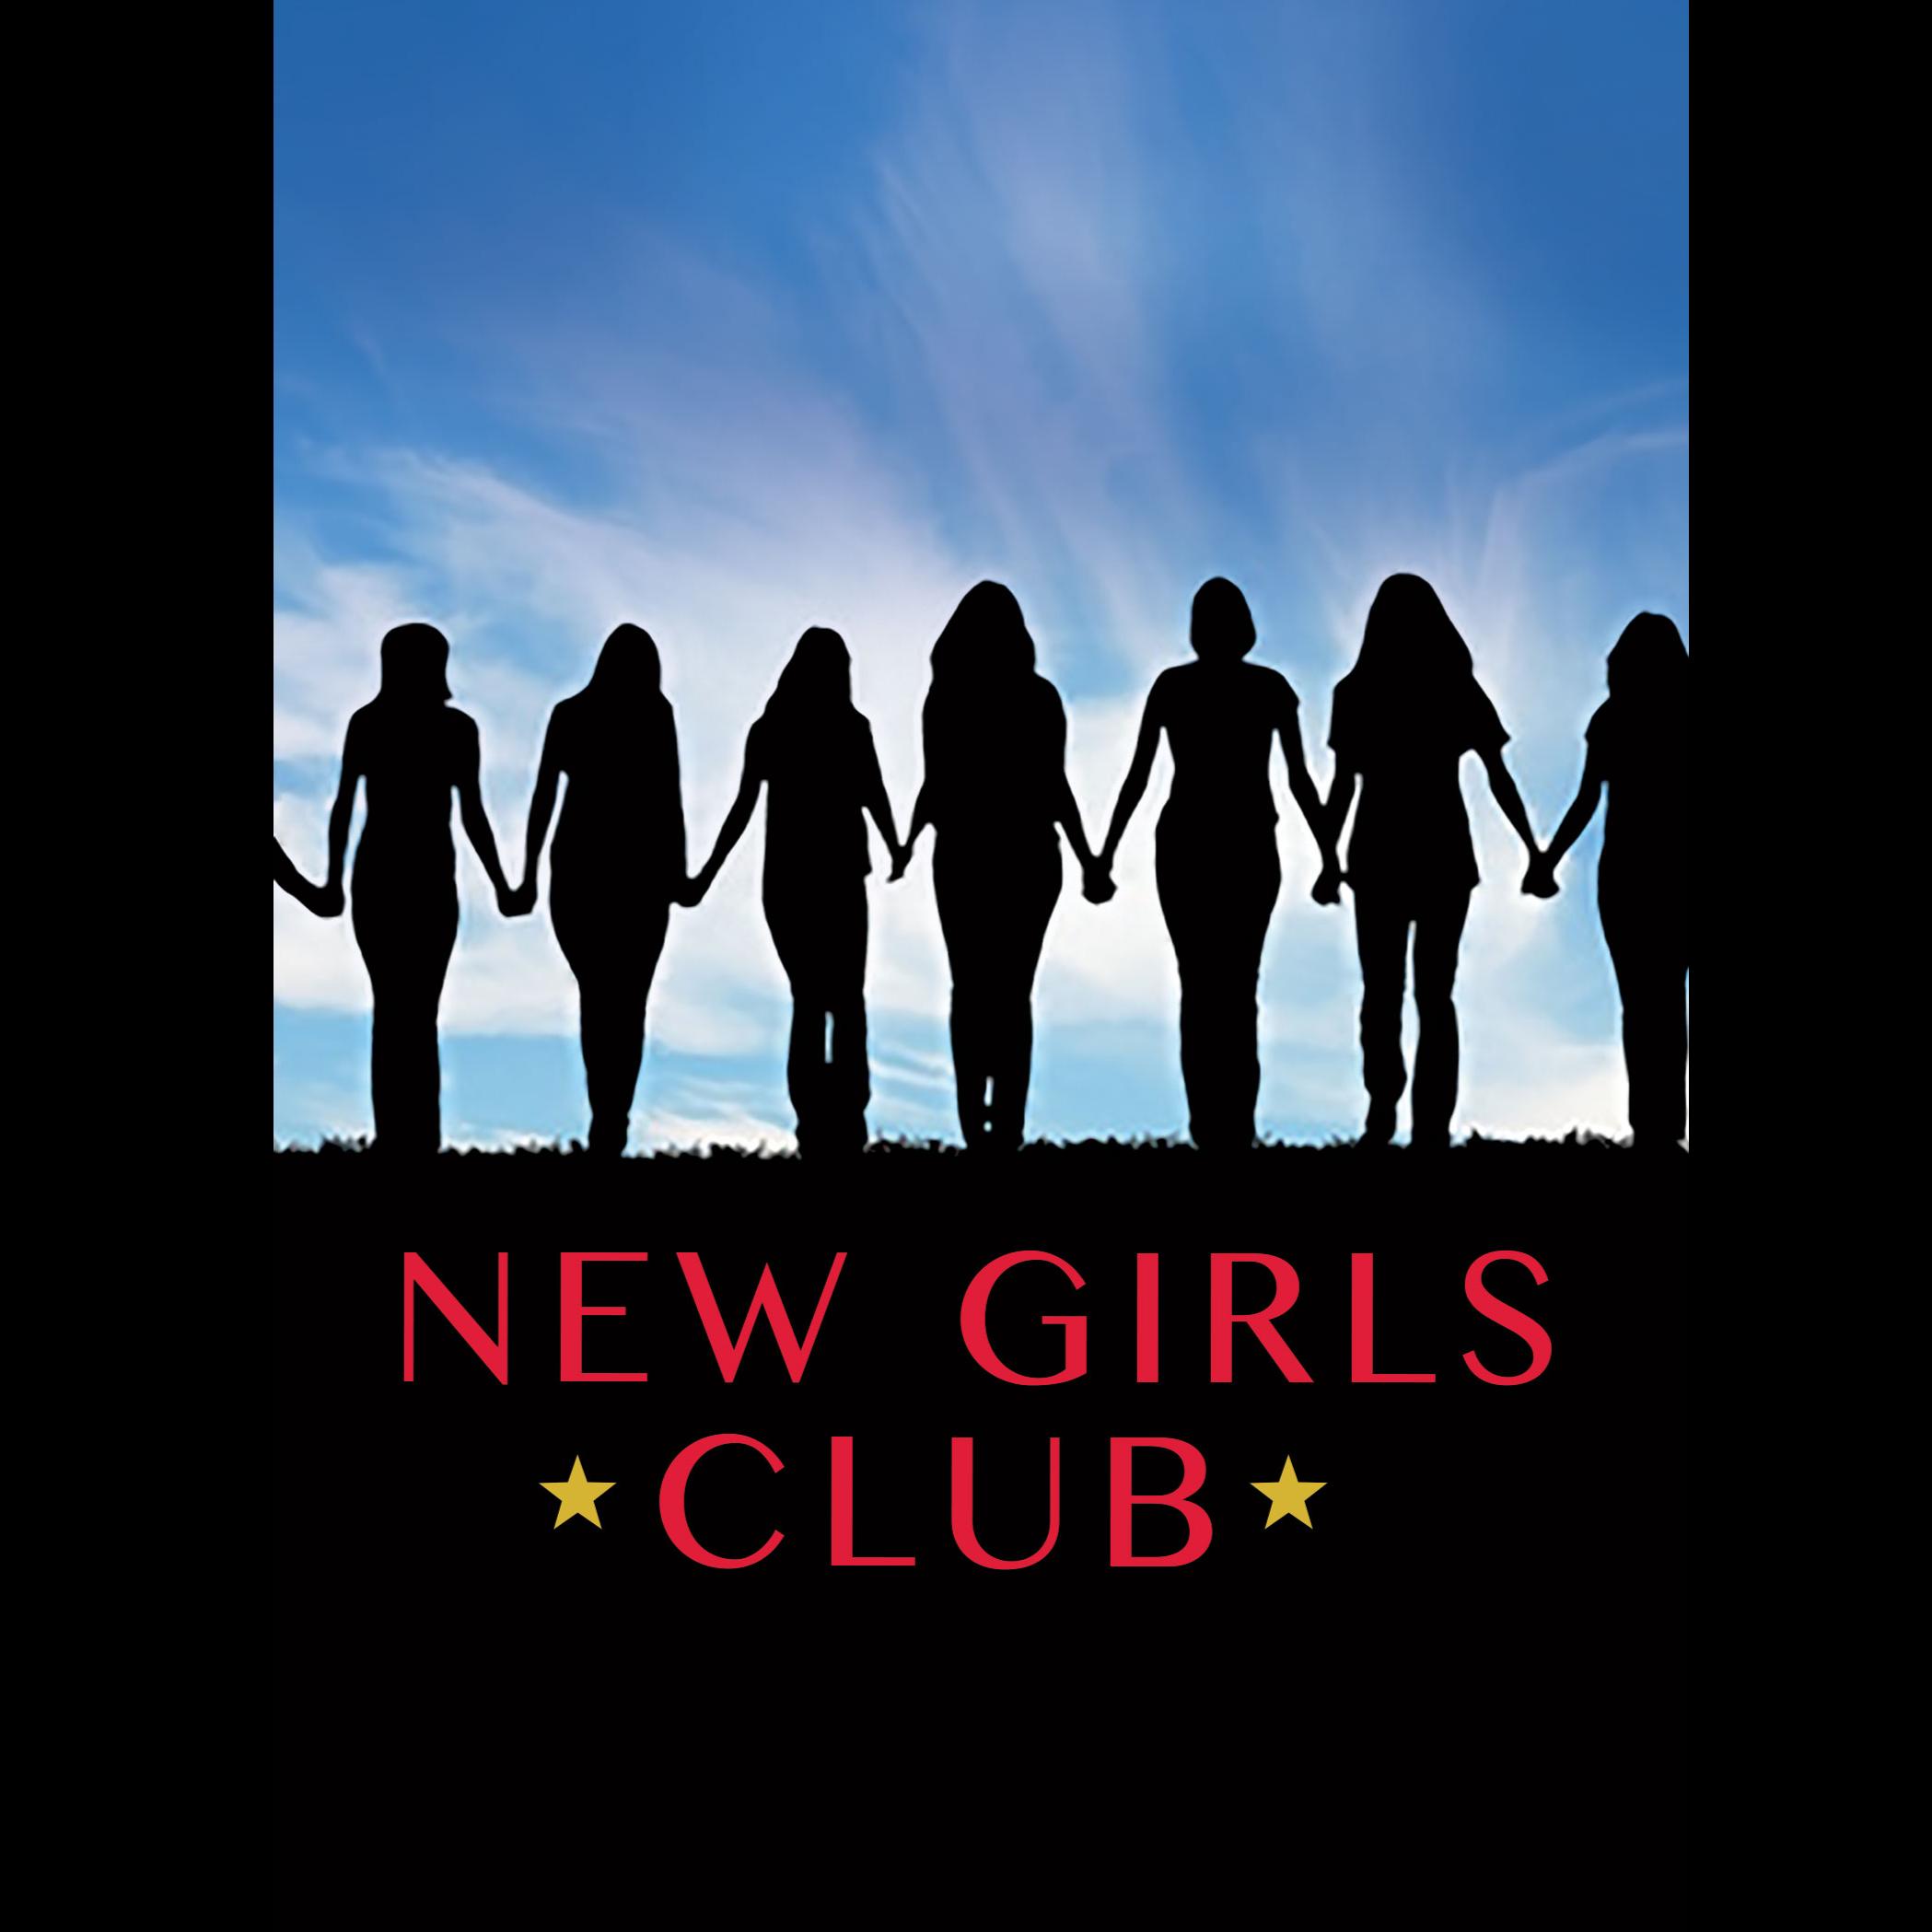 New Girls Club